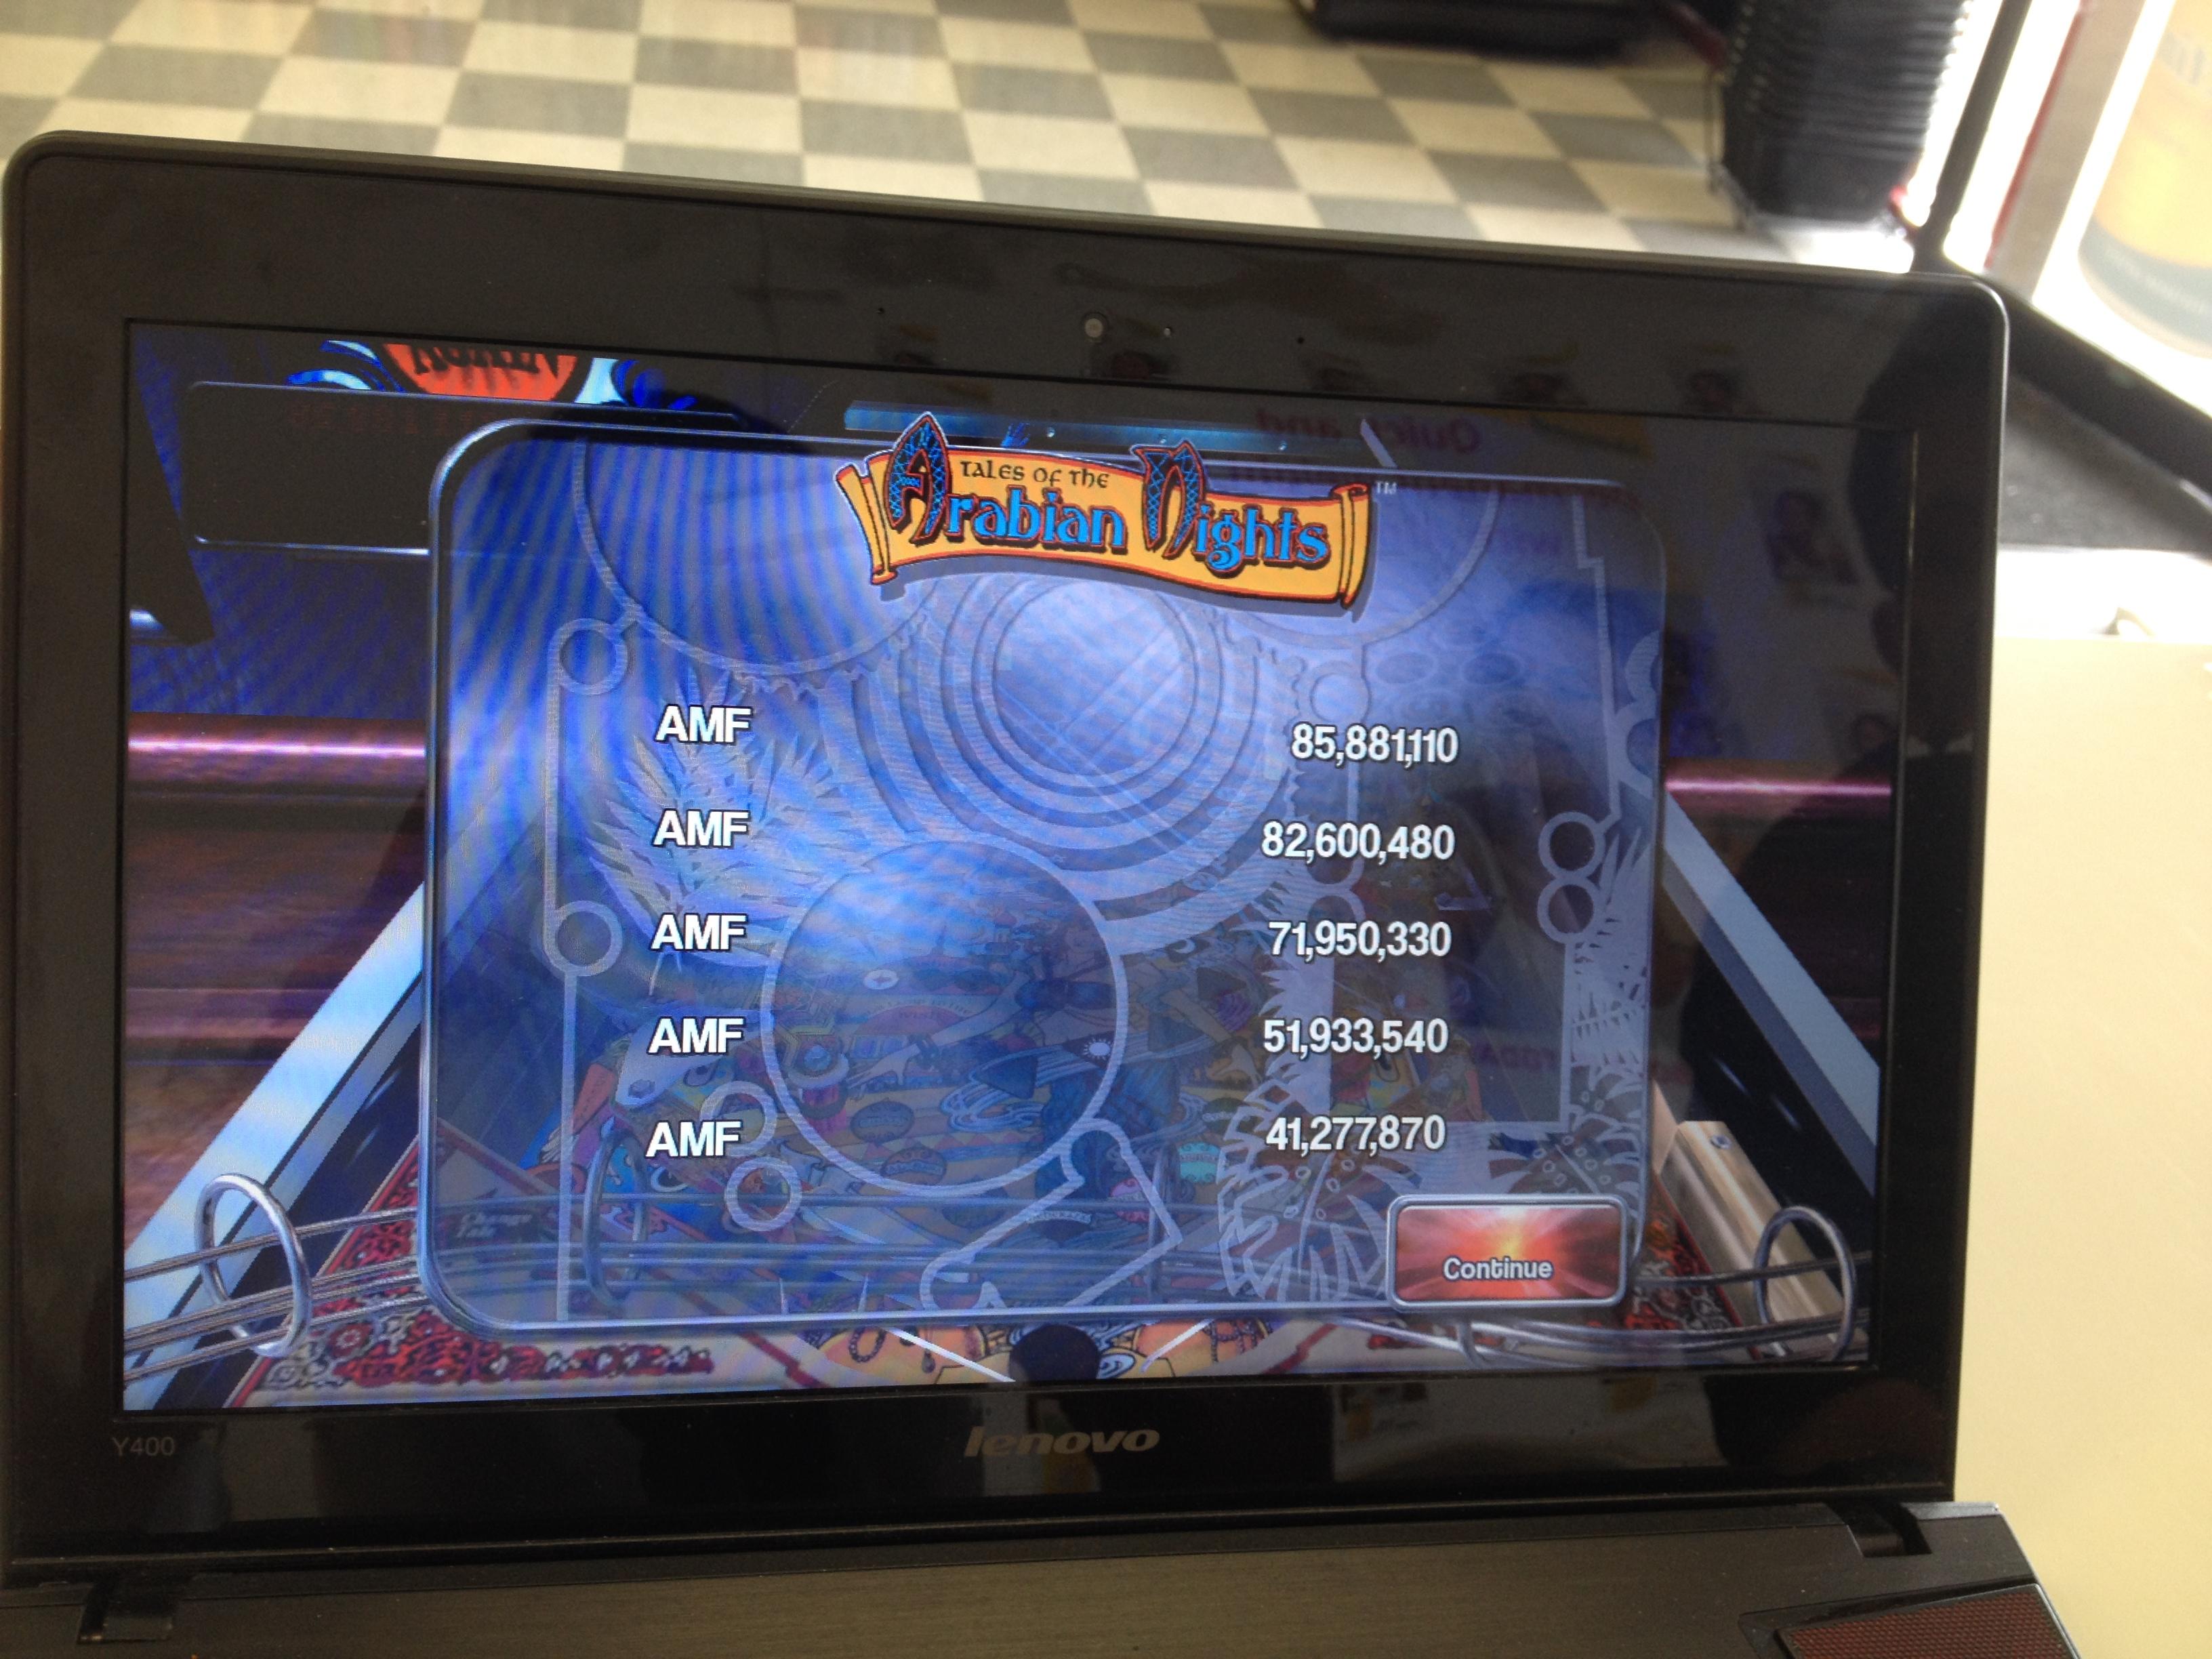 FosterAMF: Pinball Arcade: Arabian Knights (PC) 85,881,110 points on 2014-04-27 14:46:55